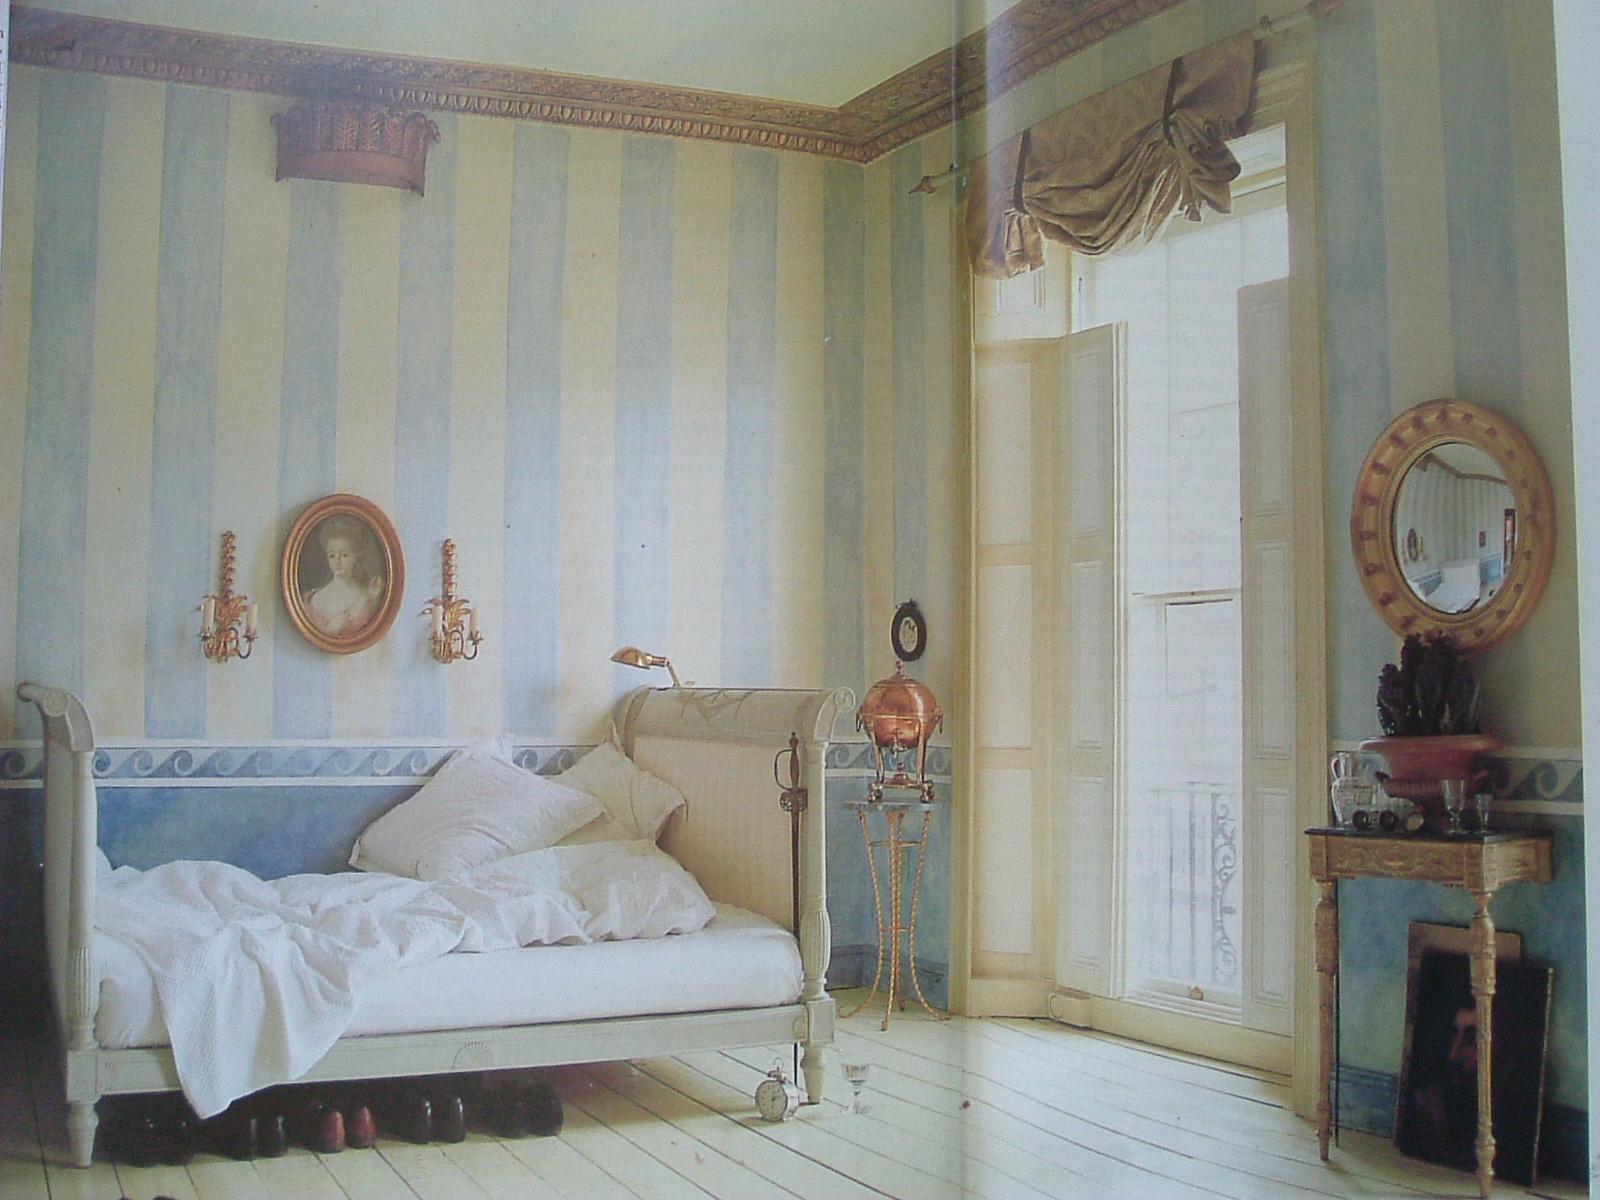 Idee Per Dipingere Cameretta : Dipingere pareti camera ragazzi idee per dipingere cameretta view